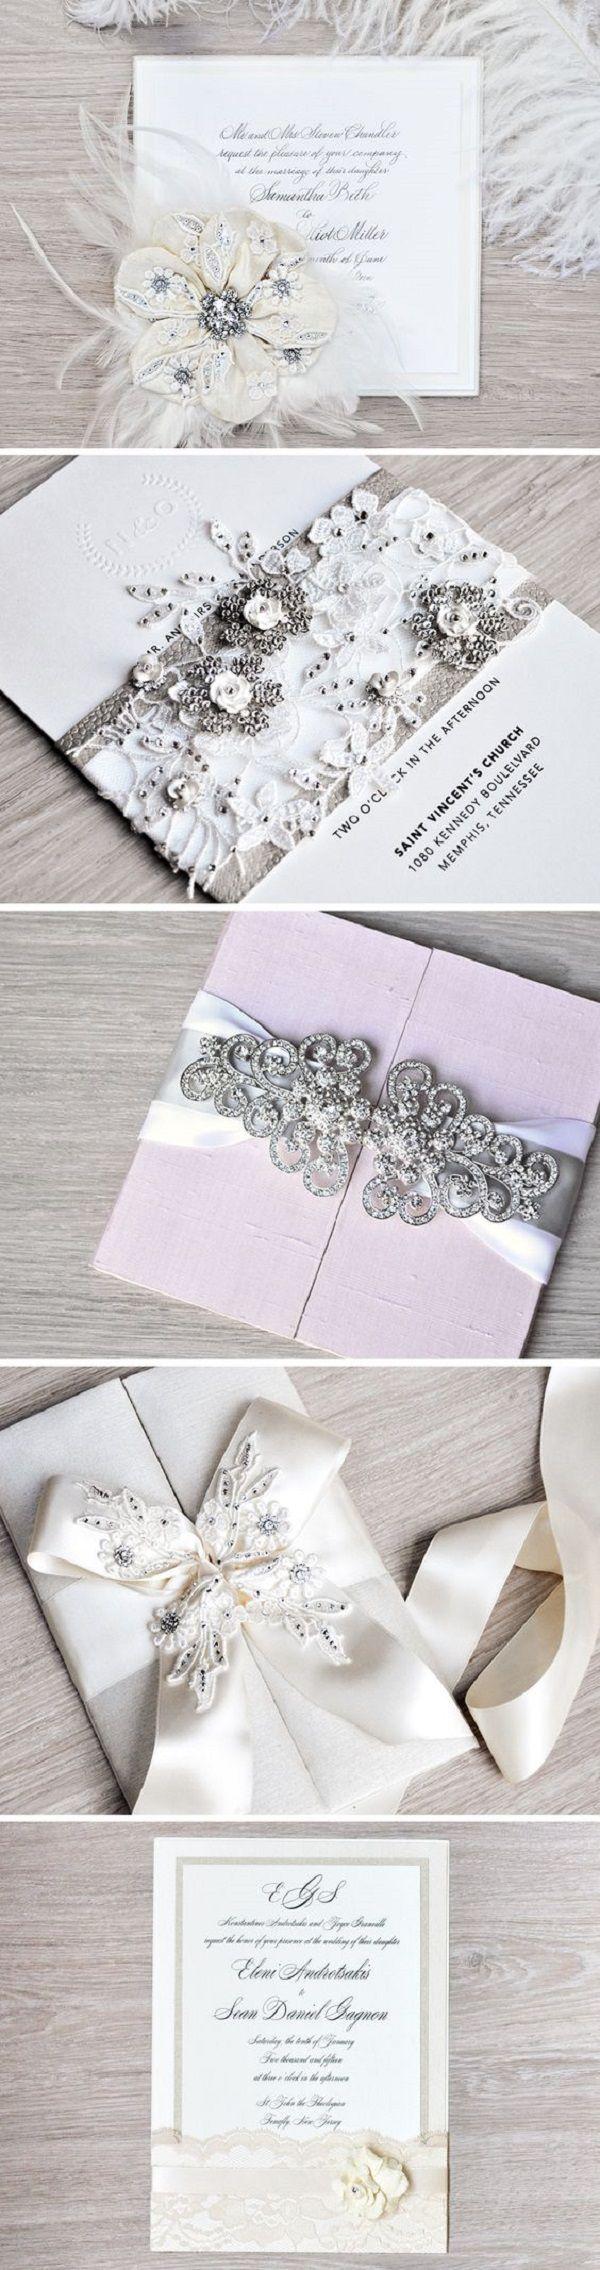 Damask u0026 Gatefold Wedding Invitation Alyssa